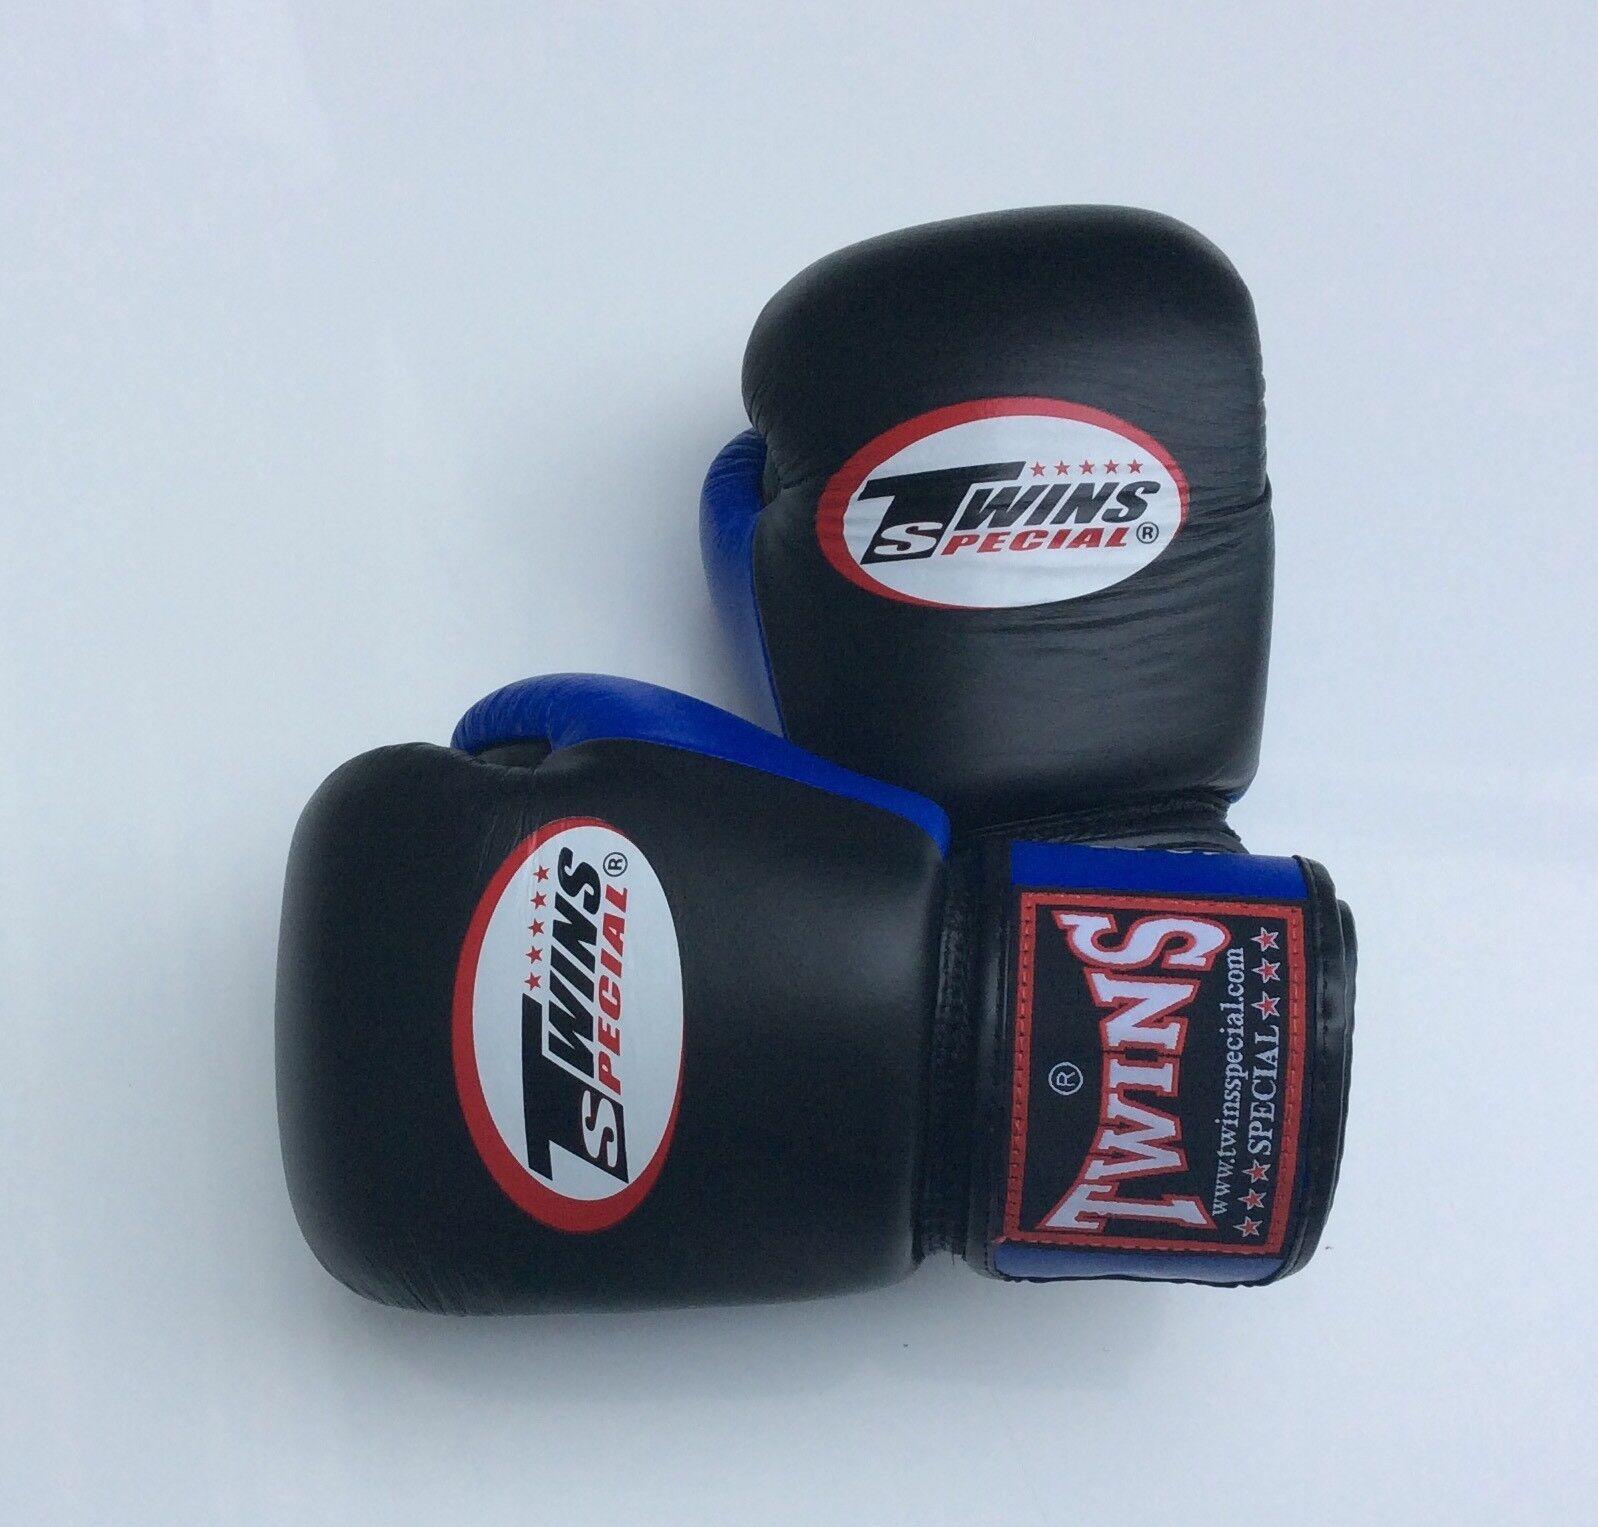 Twins Blk/Blau Special Bgvl-3T Blk/Blau Twins 12oz Muay Thai/ Boxing Gloves 4f4b23